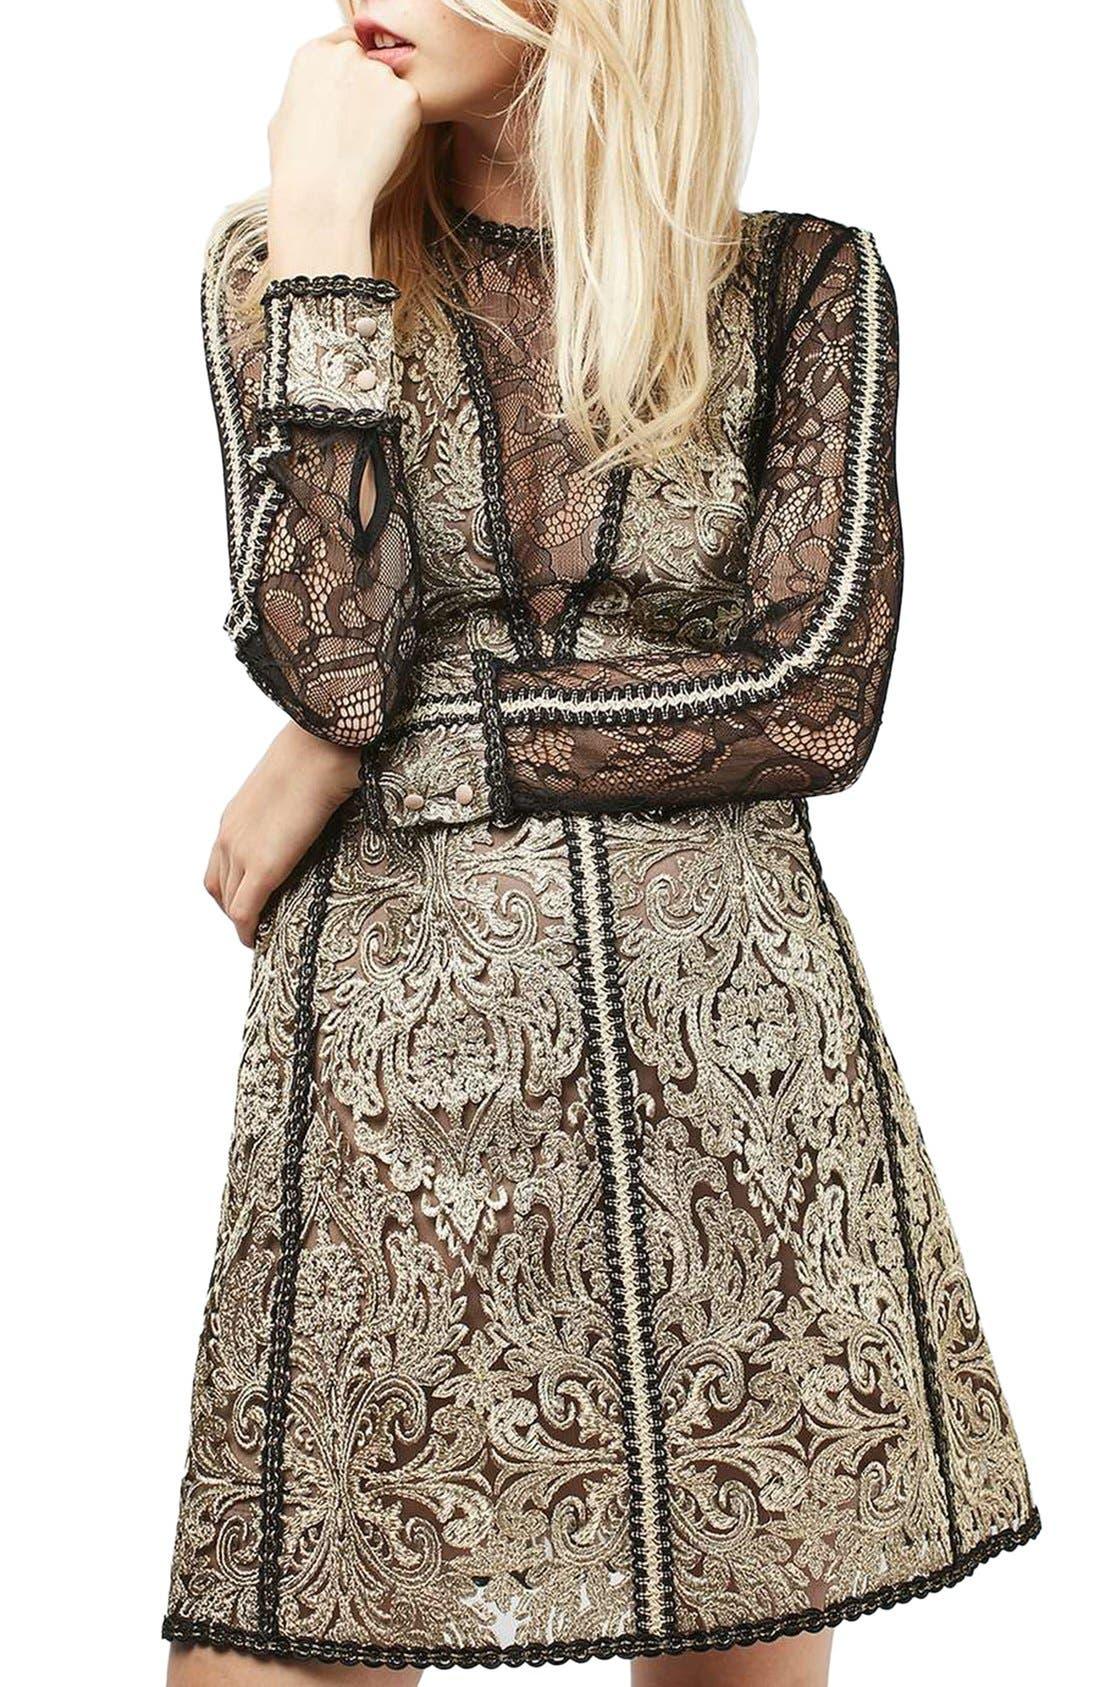 Alternate Image 1 Selected - Topshop Lace A-Line Dress